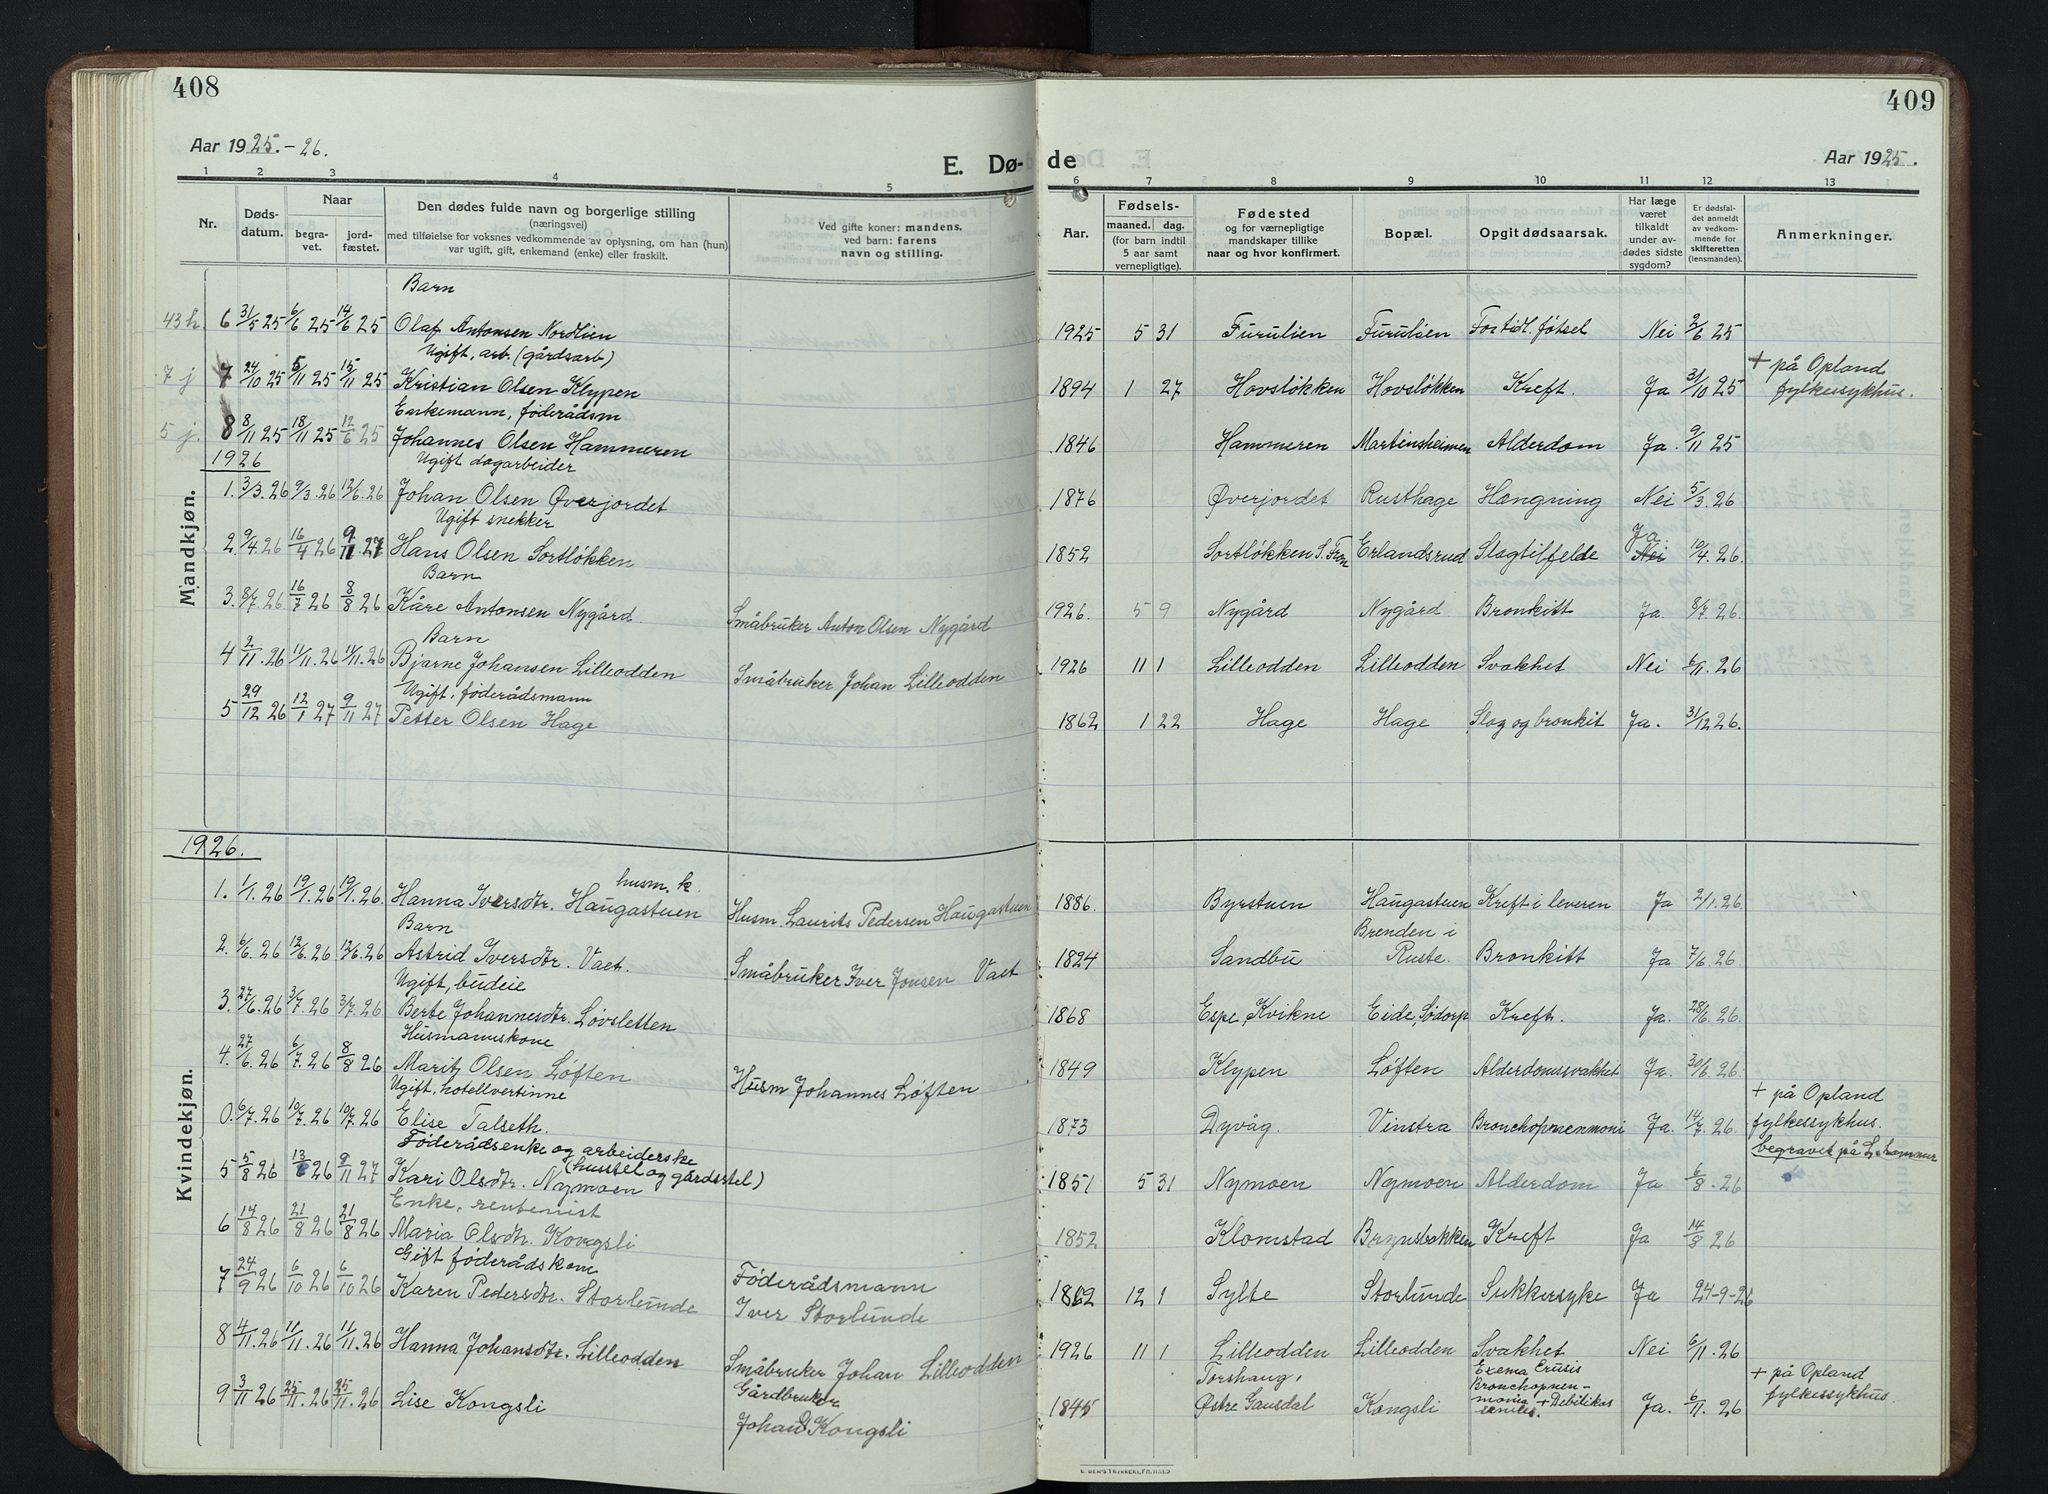 SAH, Nord-Fron prestekontor, Klokkerbok nr. 7, 1915-1946, s. 408-409